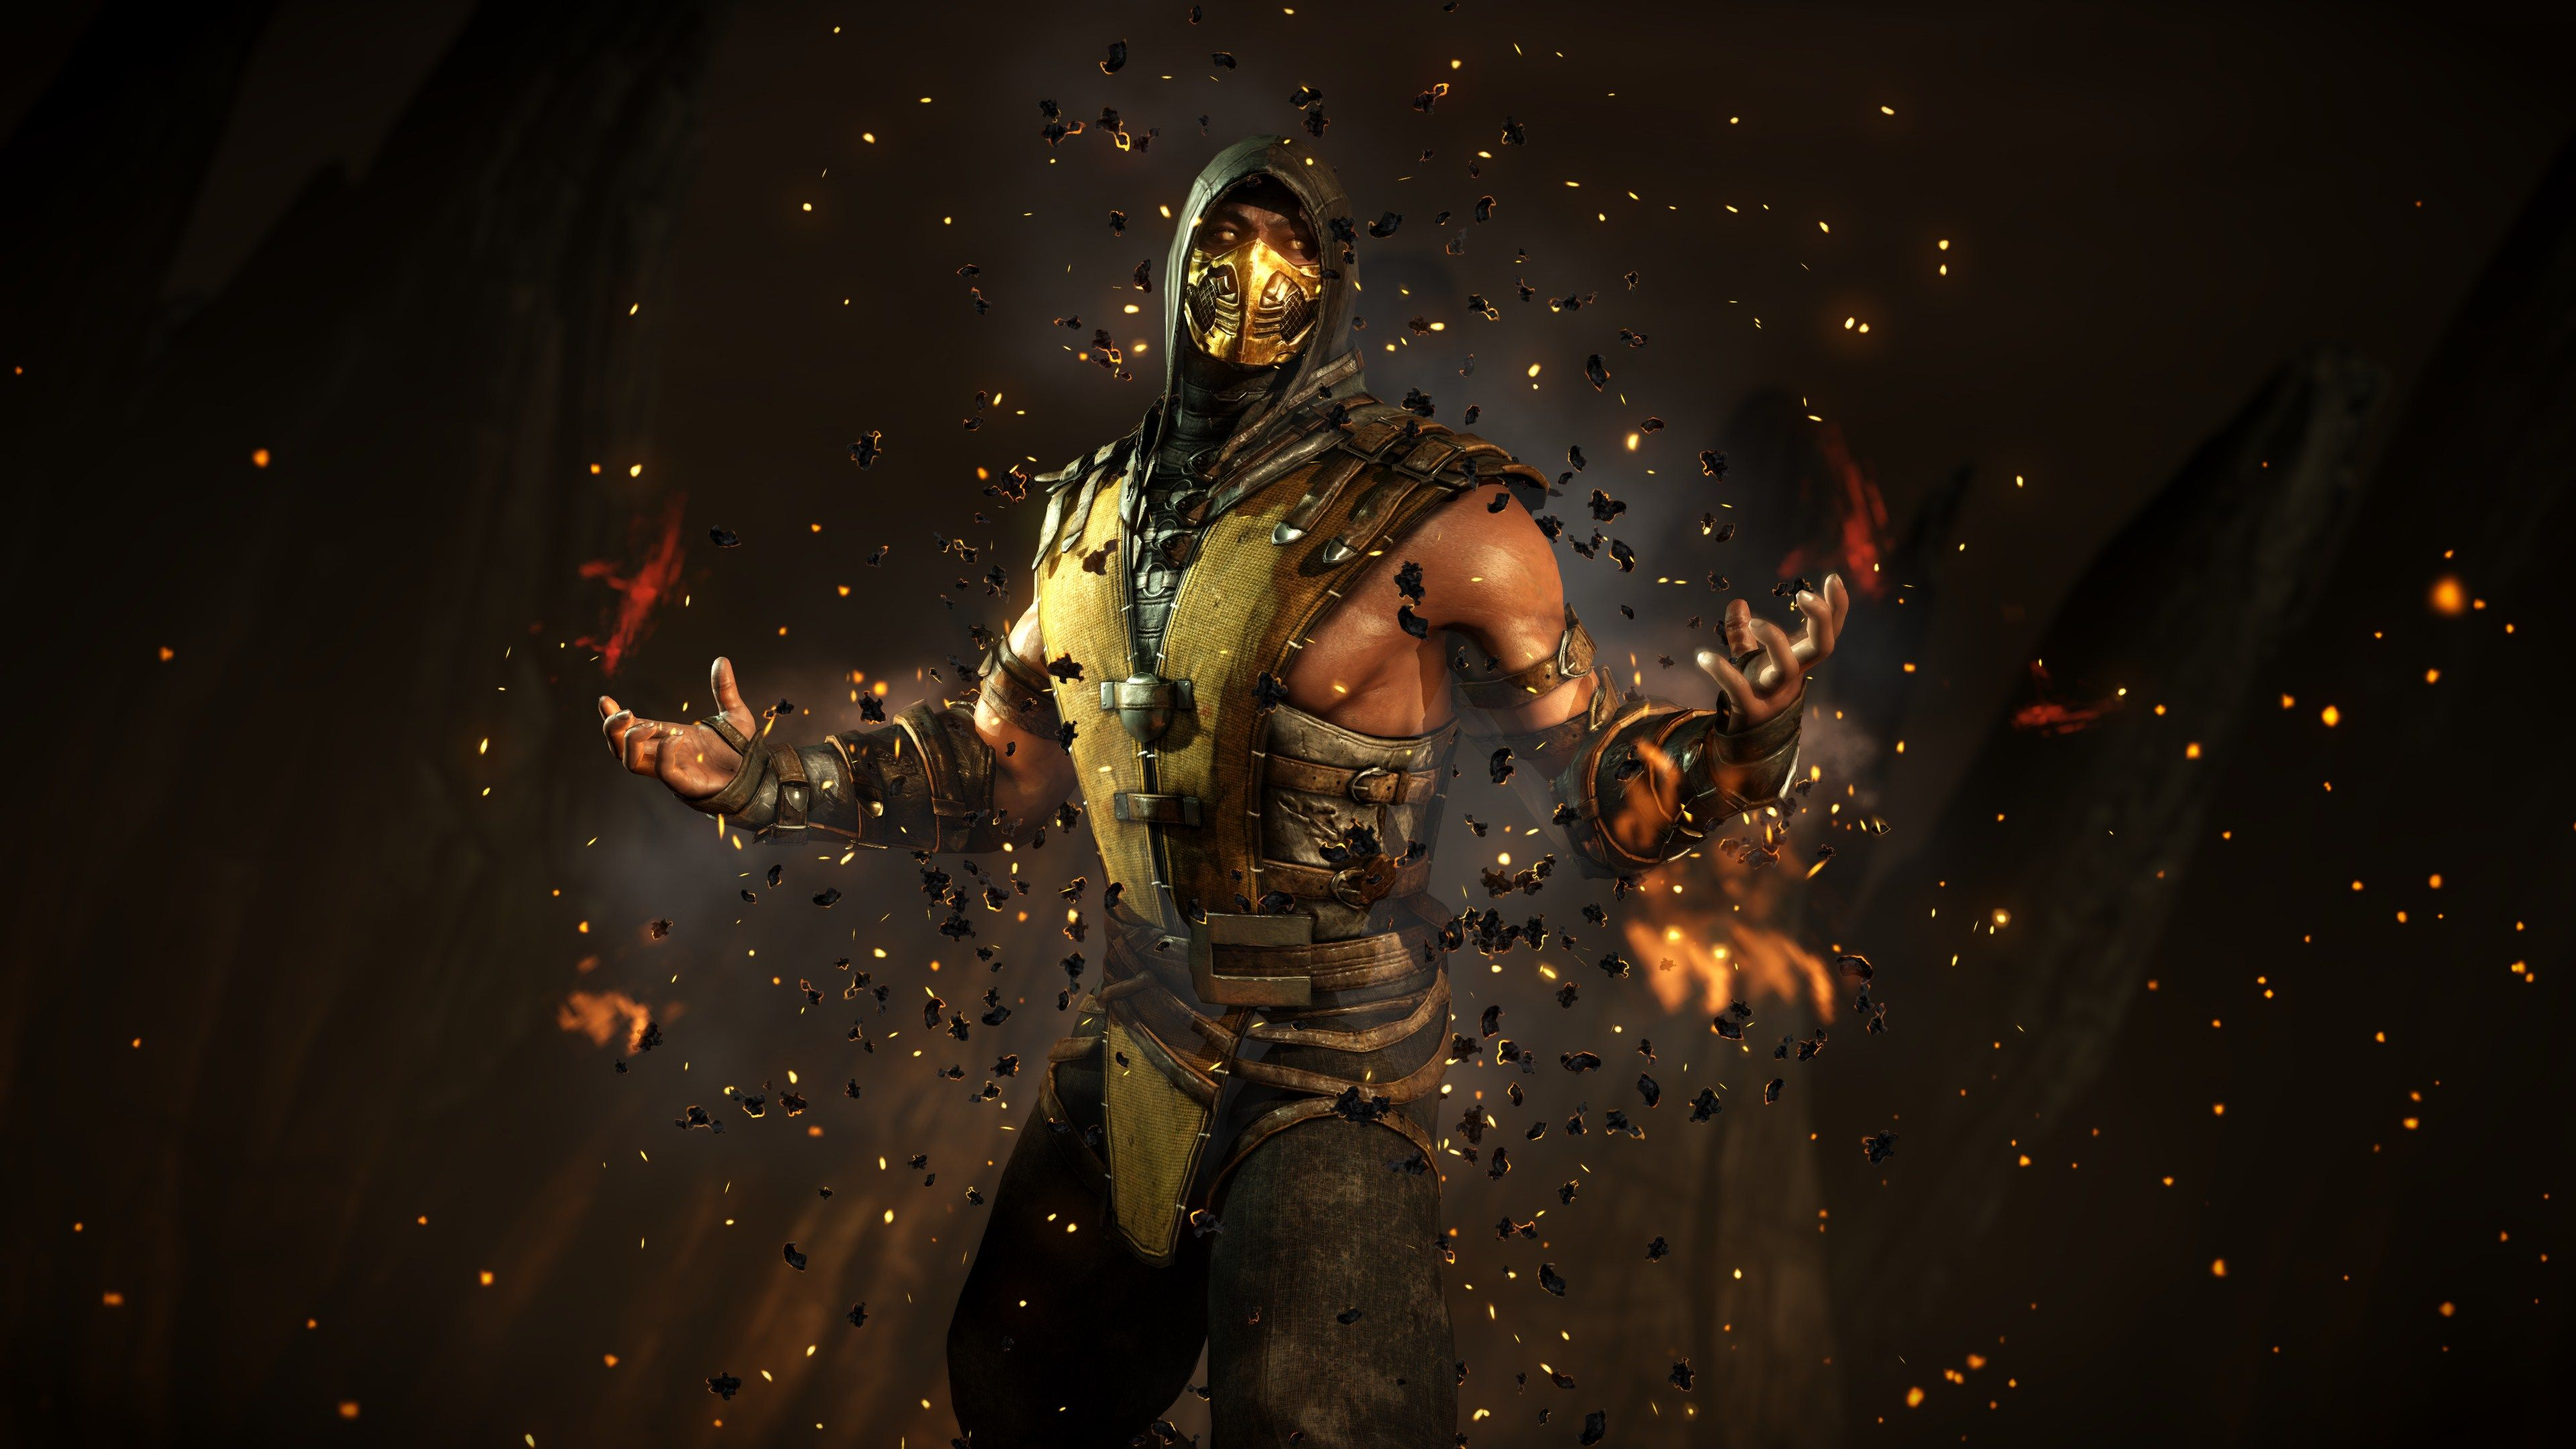 Scorpion Ultra HD Wallpaper Picture Image 3840x2160